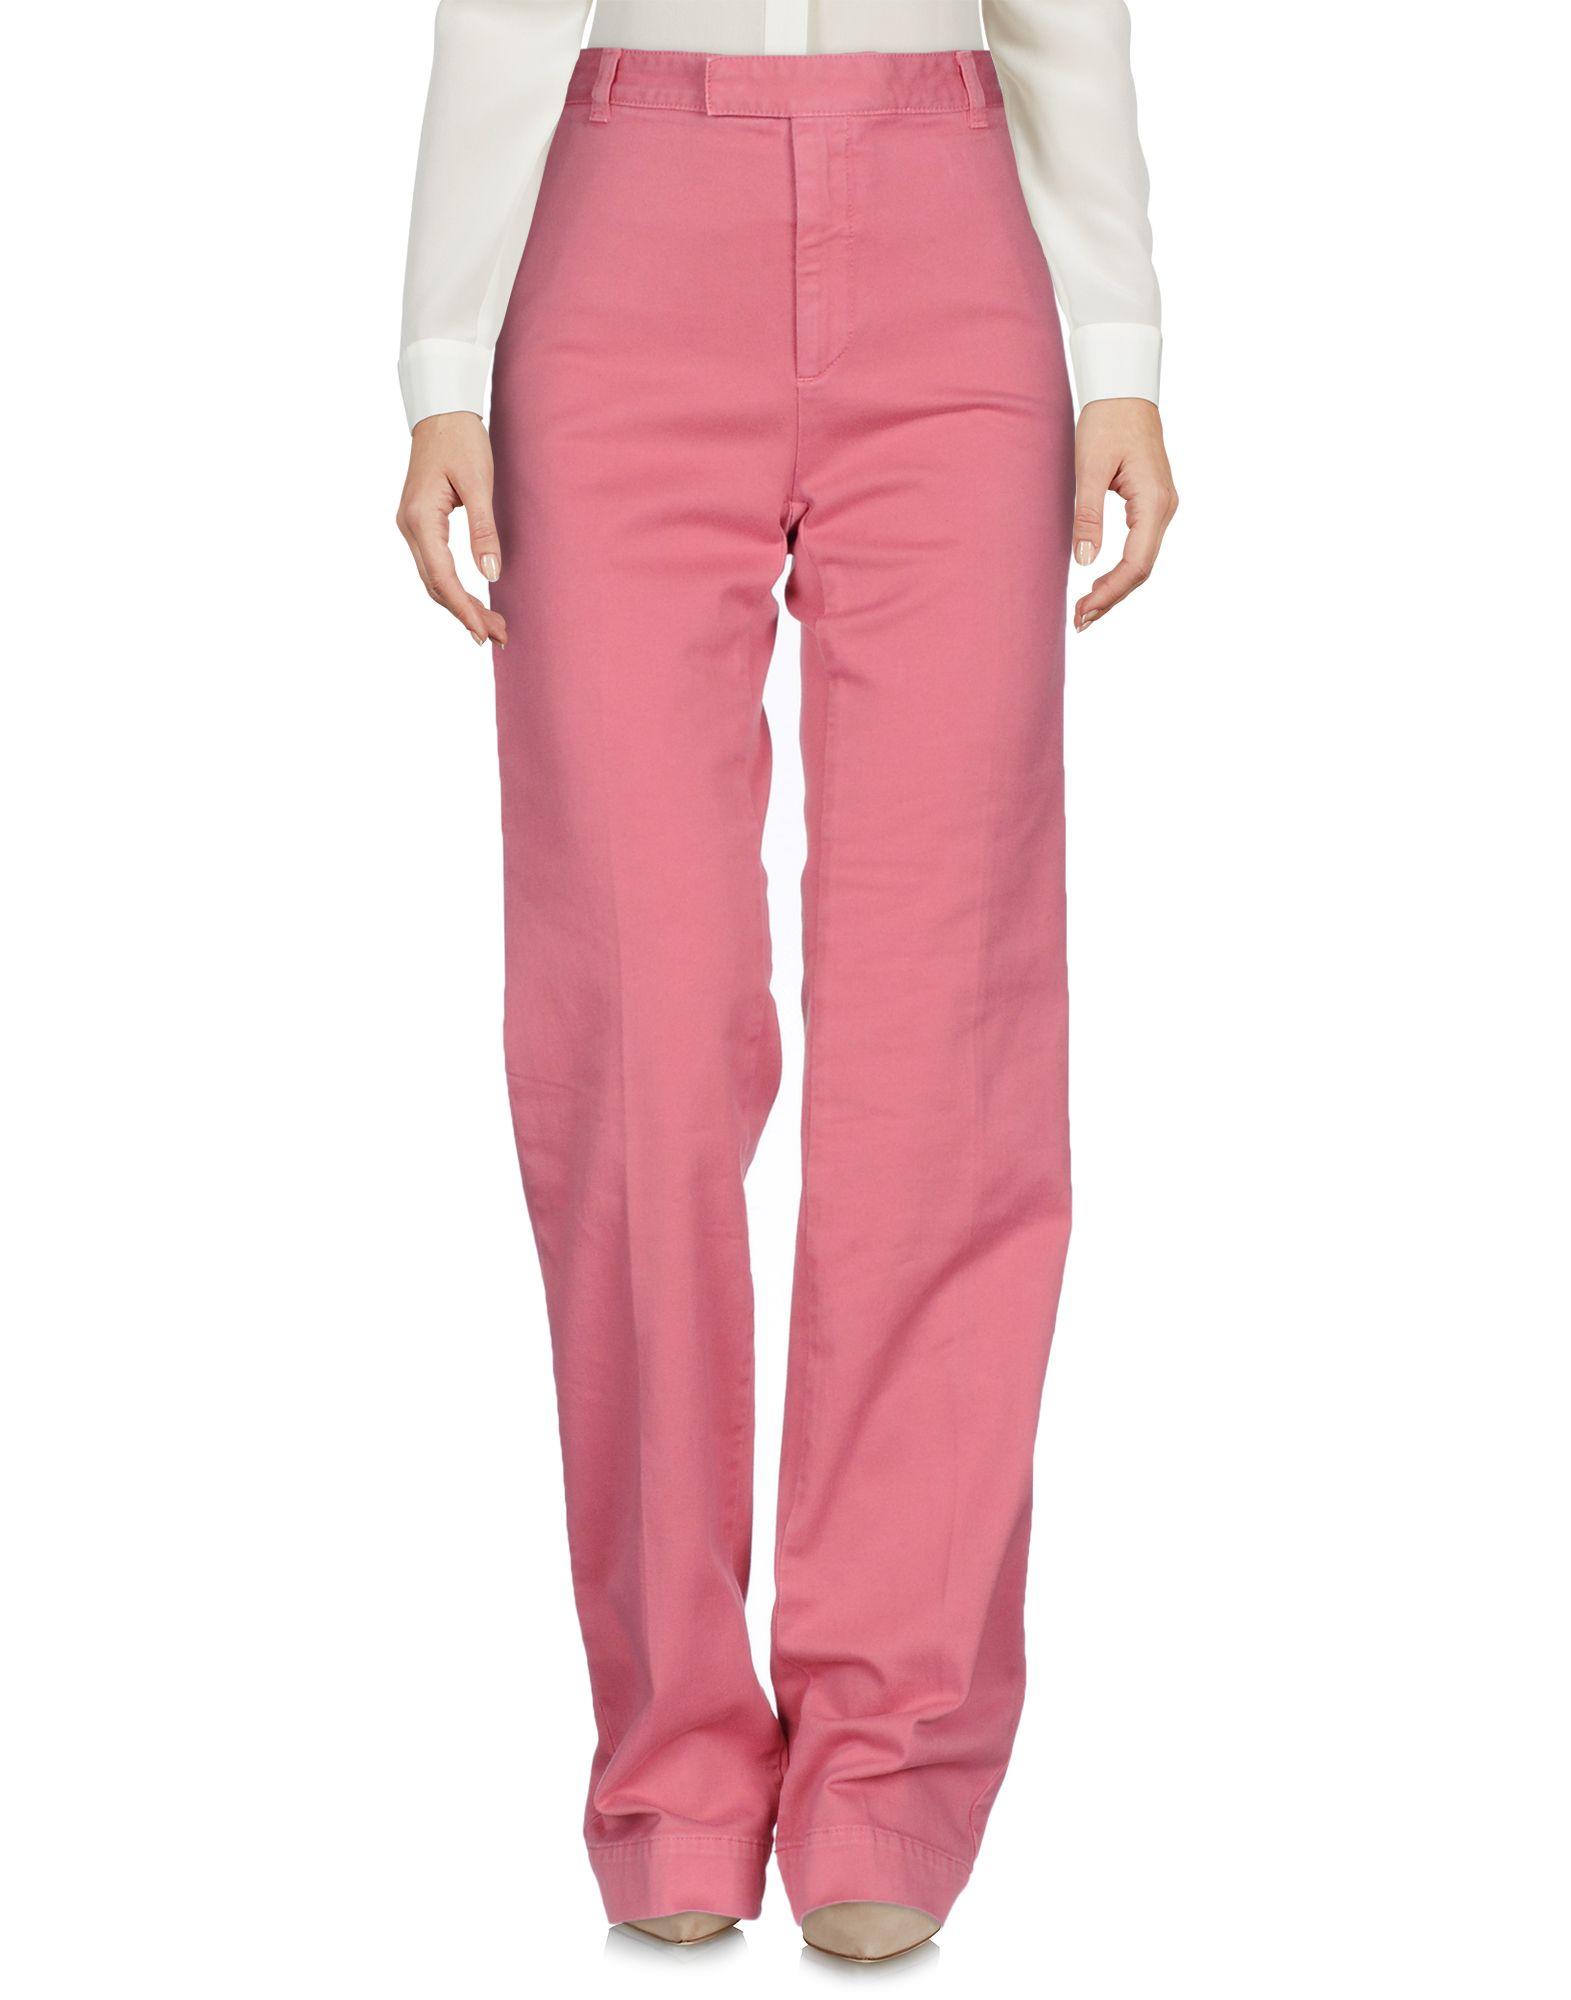 pink-bj-pant-daniella-westbrook-upskirt